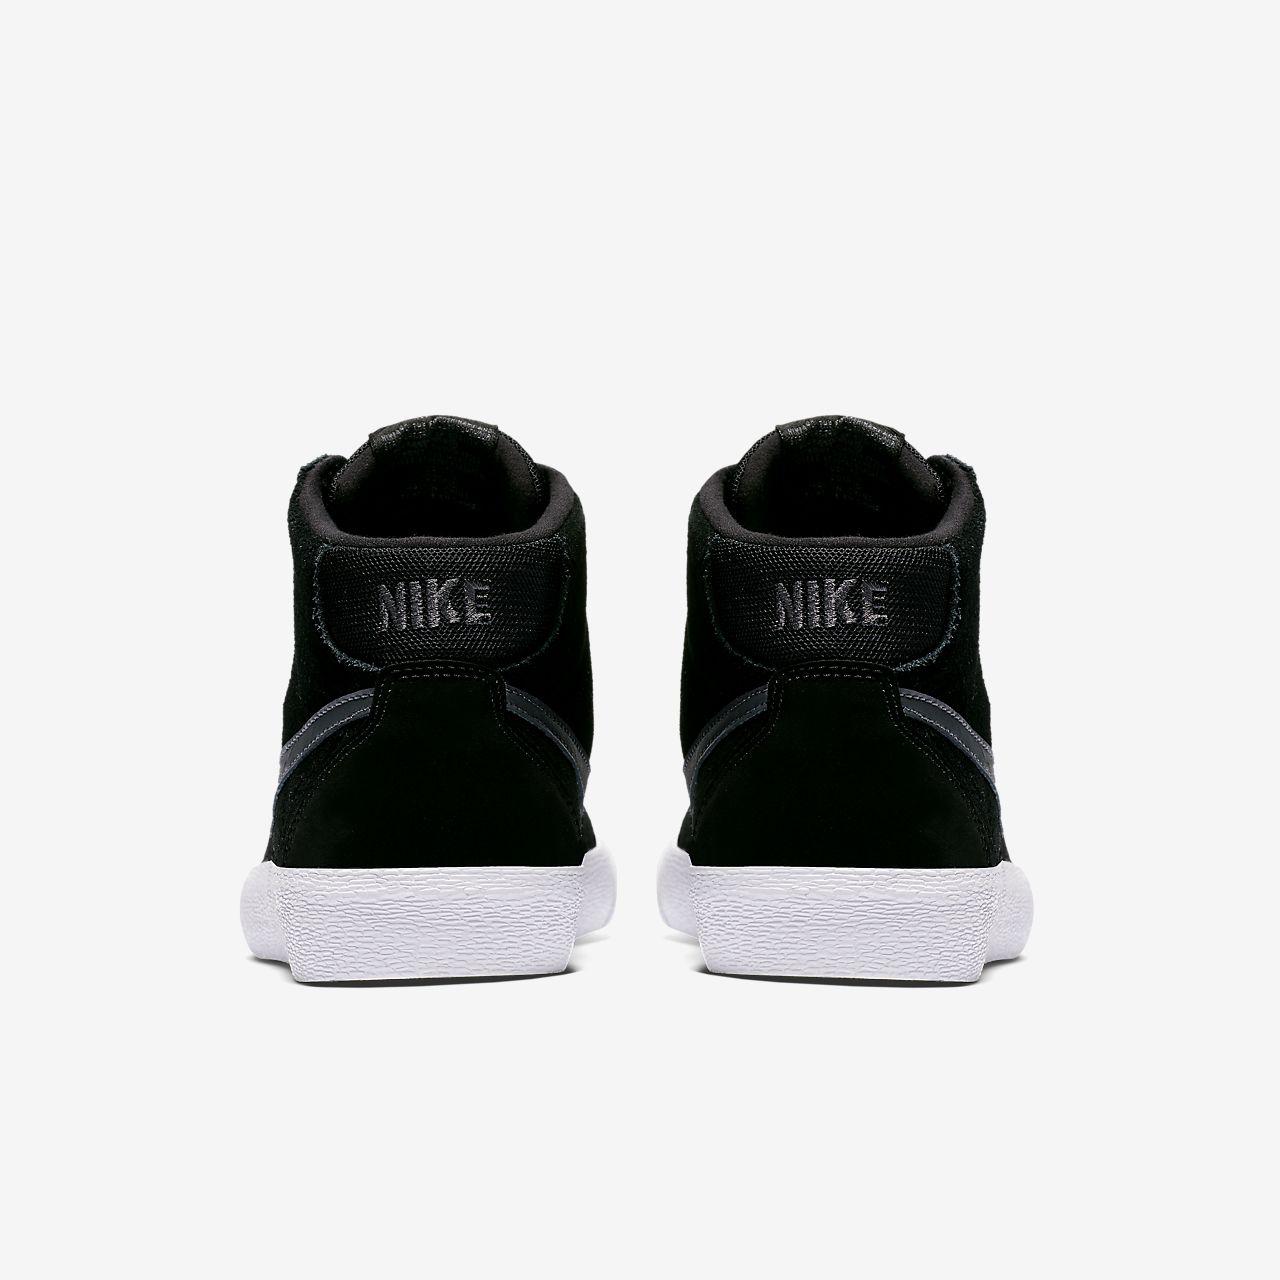 02ca0a3c61f31f Nike SB Bruin High Women s Skateboarding Shoe. Nike.com